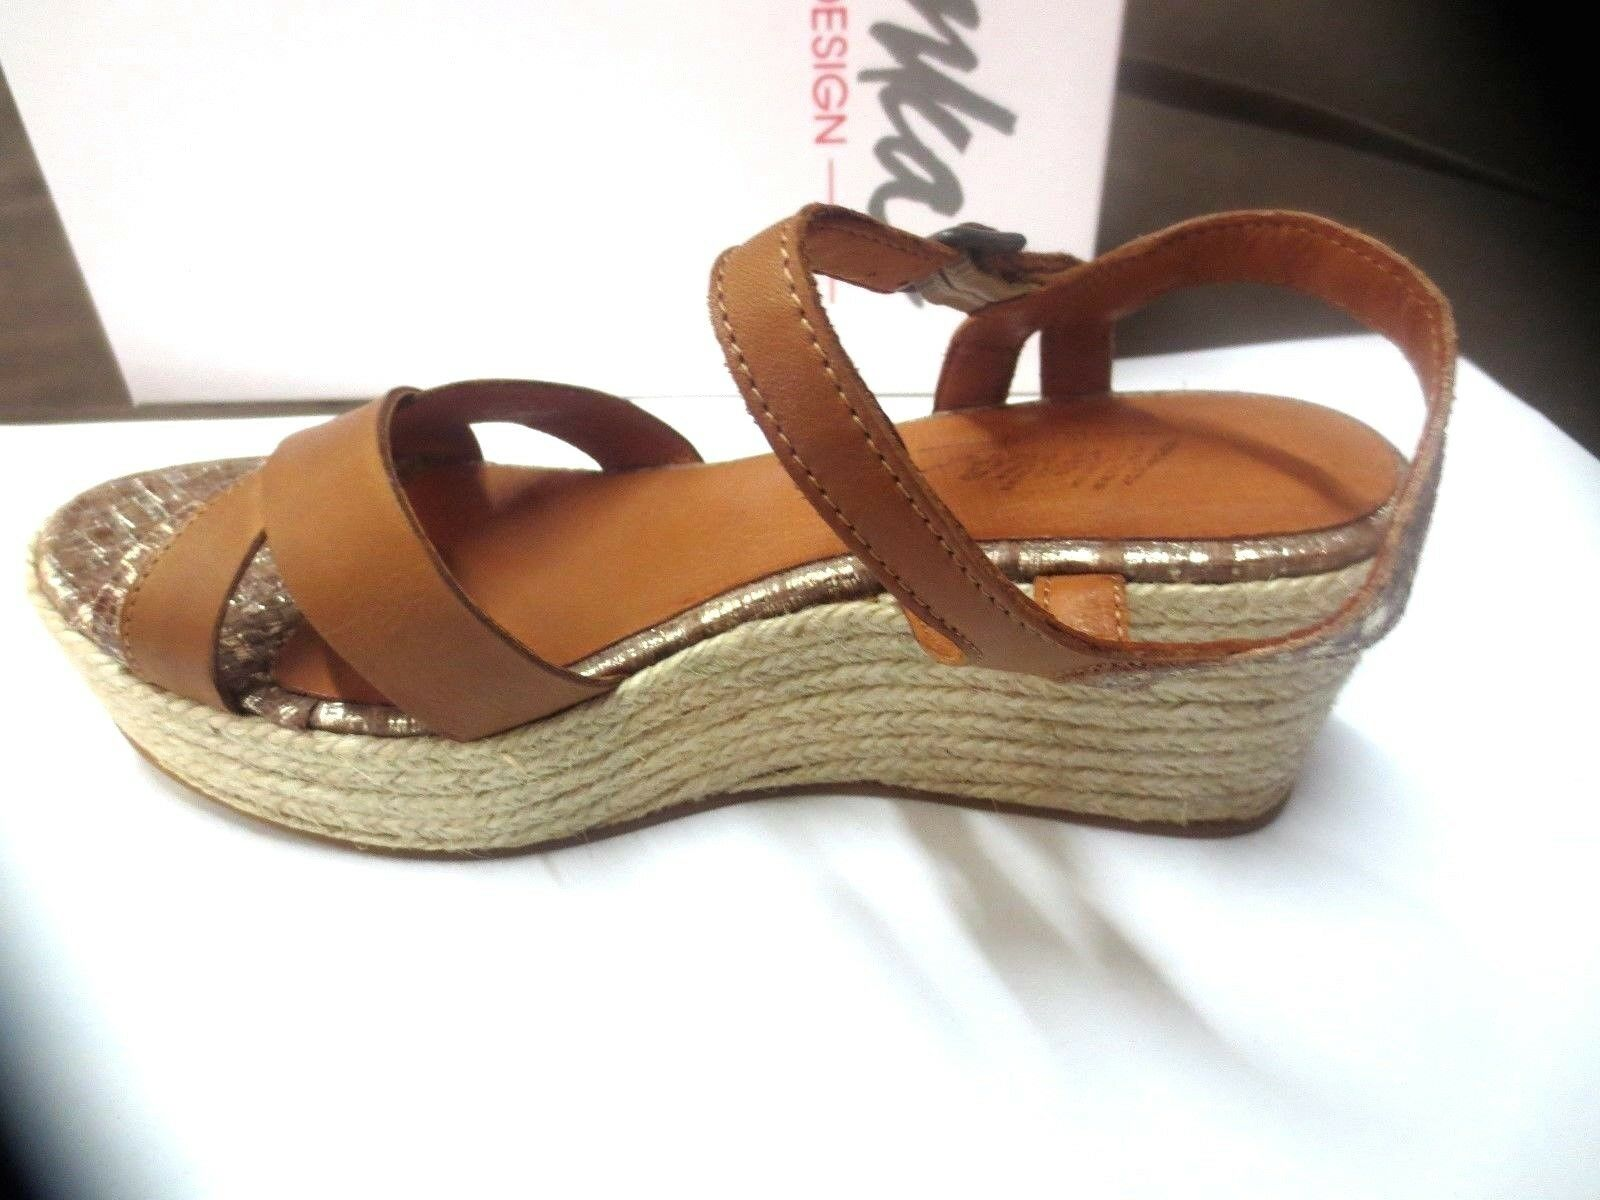 Minka design sandale compensé cuir  camel NEUF Valeur 129E Pointure,39.